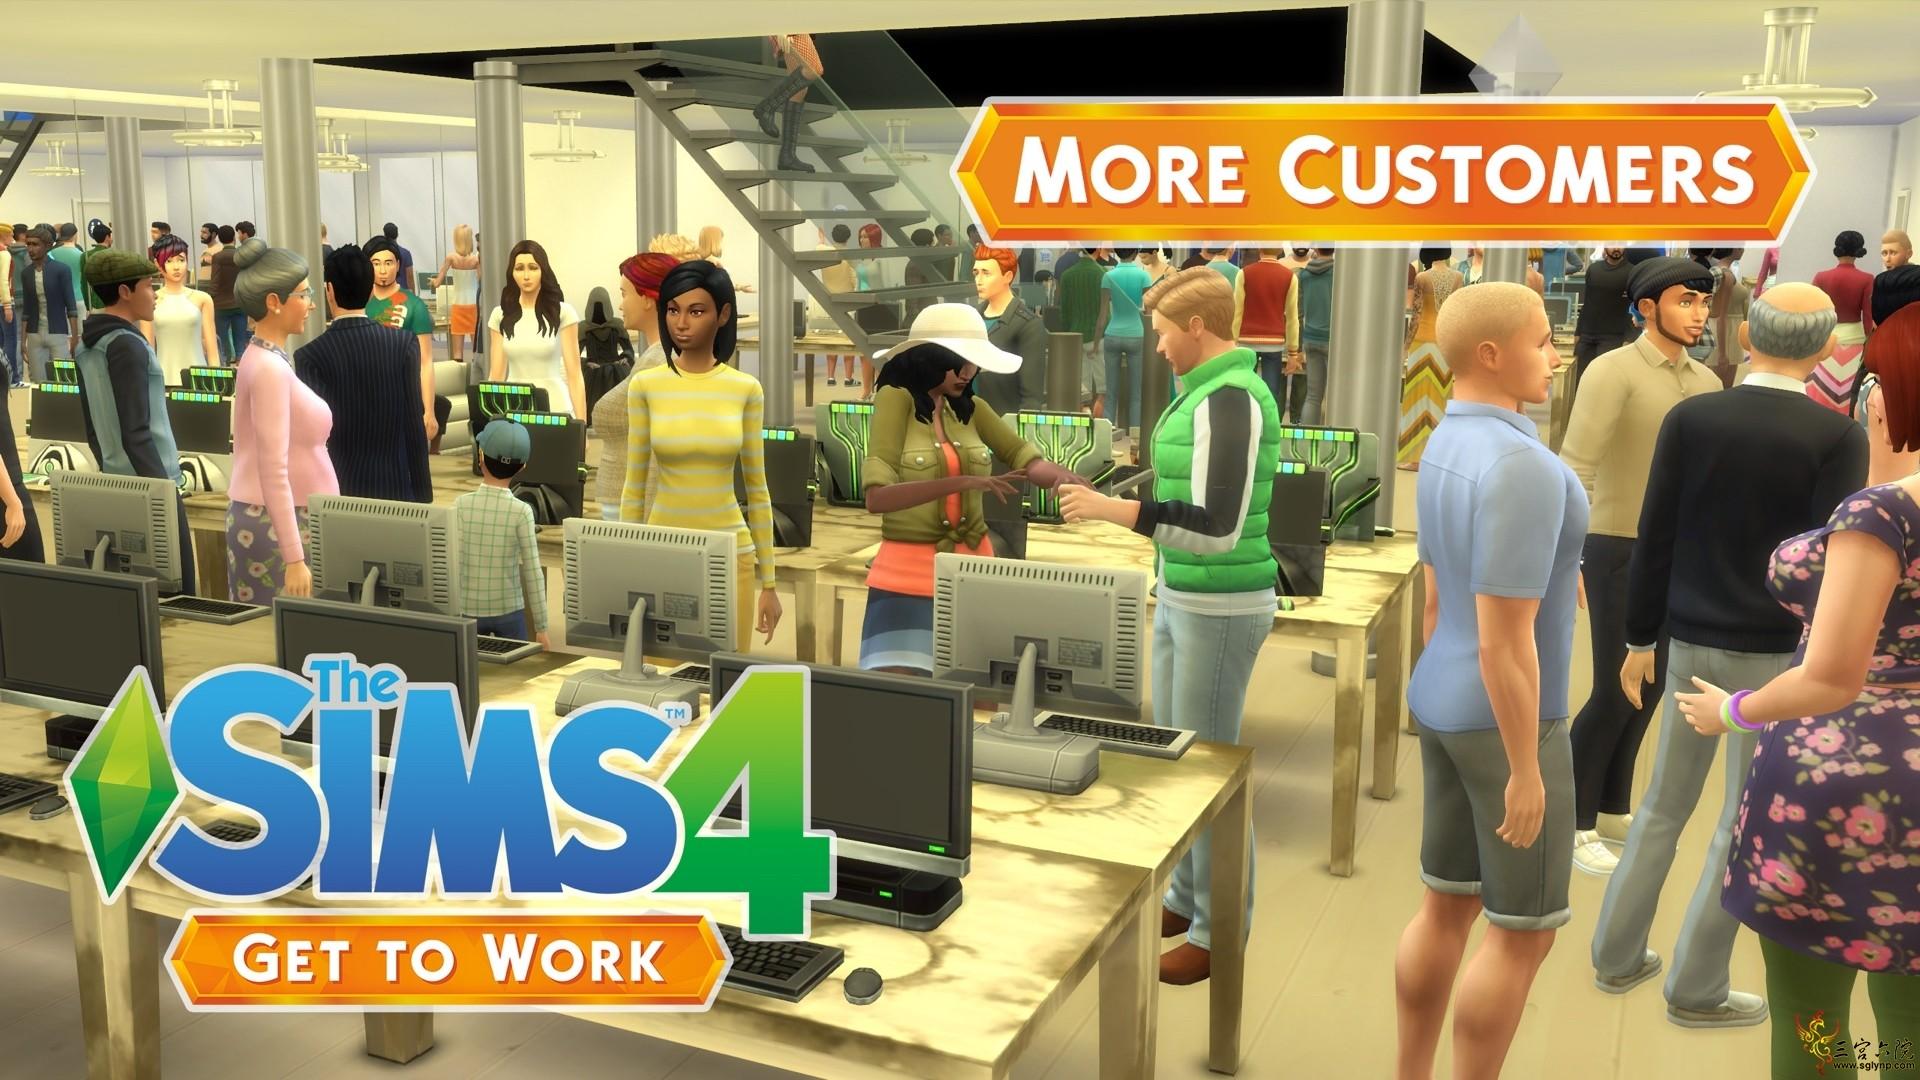 MTS_weerbesu-1556199-customers.jpg